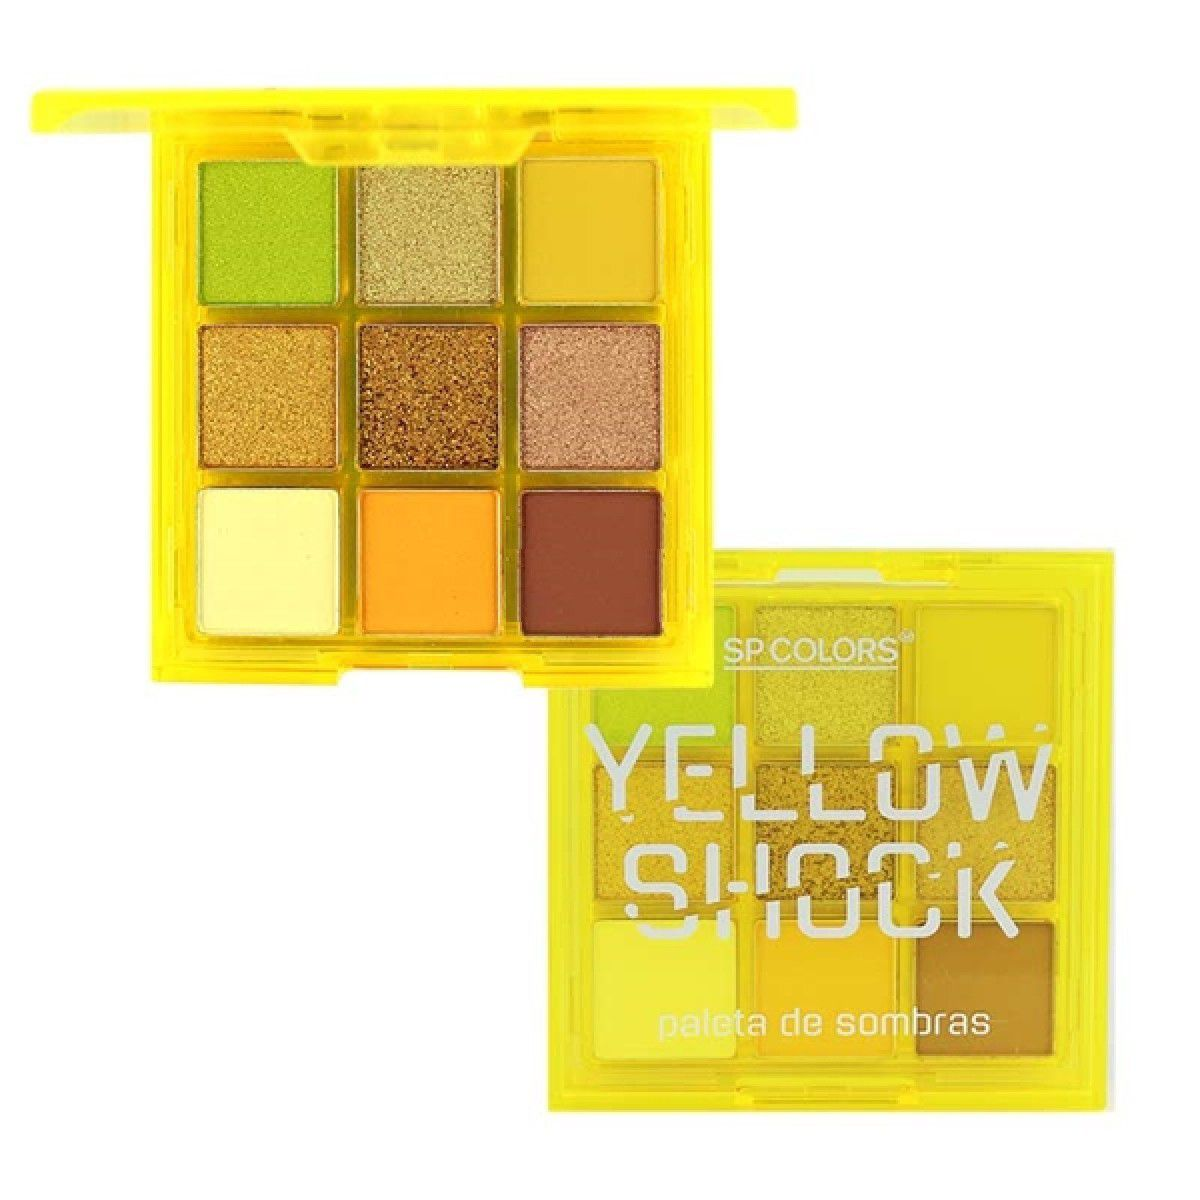 Paleta de Sombras 9 cores Yellow Shock - SP COLORS